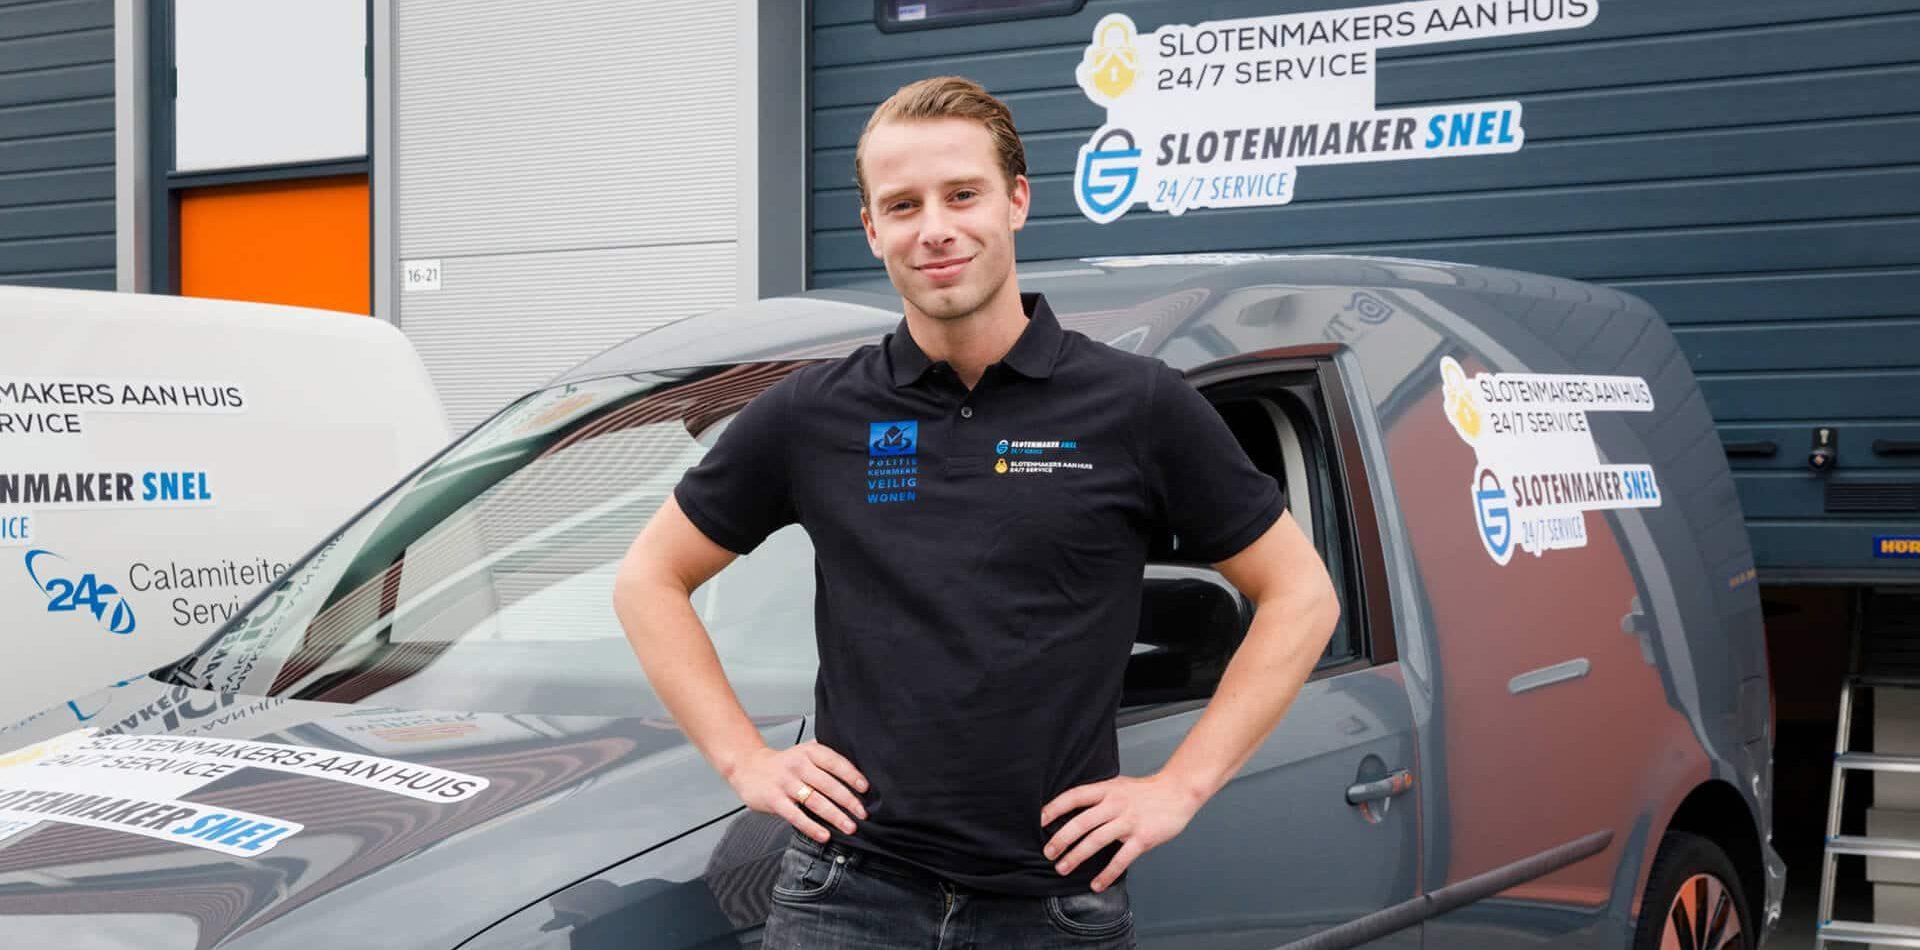 Slotenmaker Kortenhoef